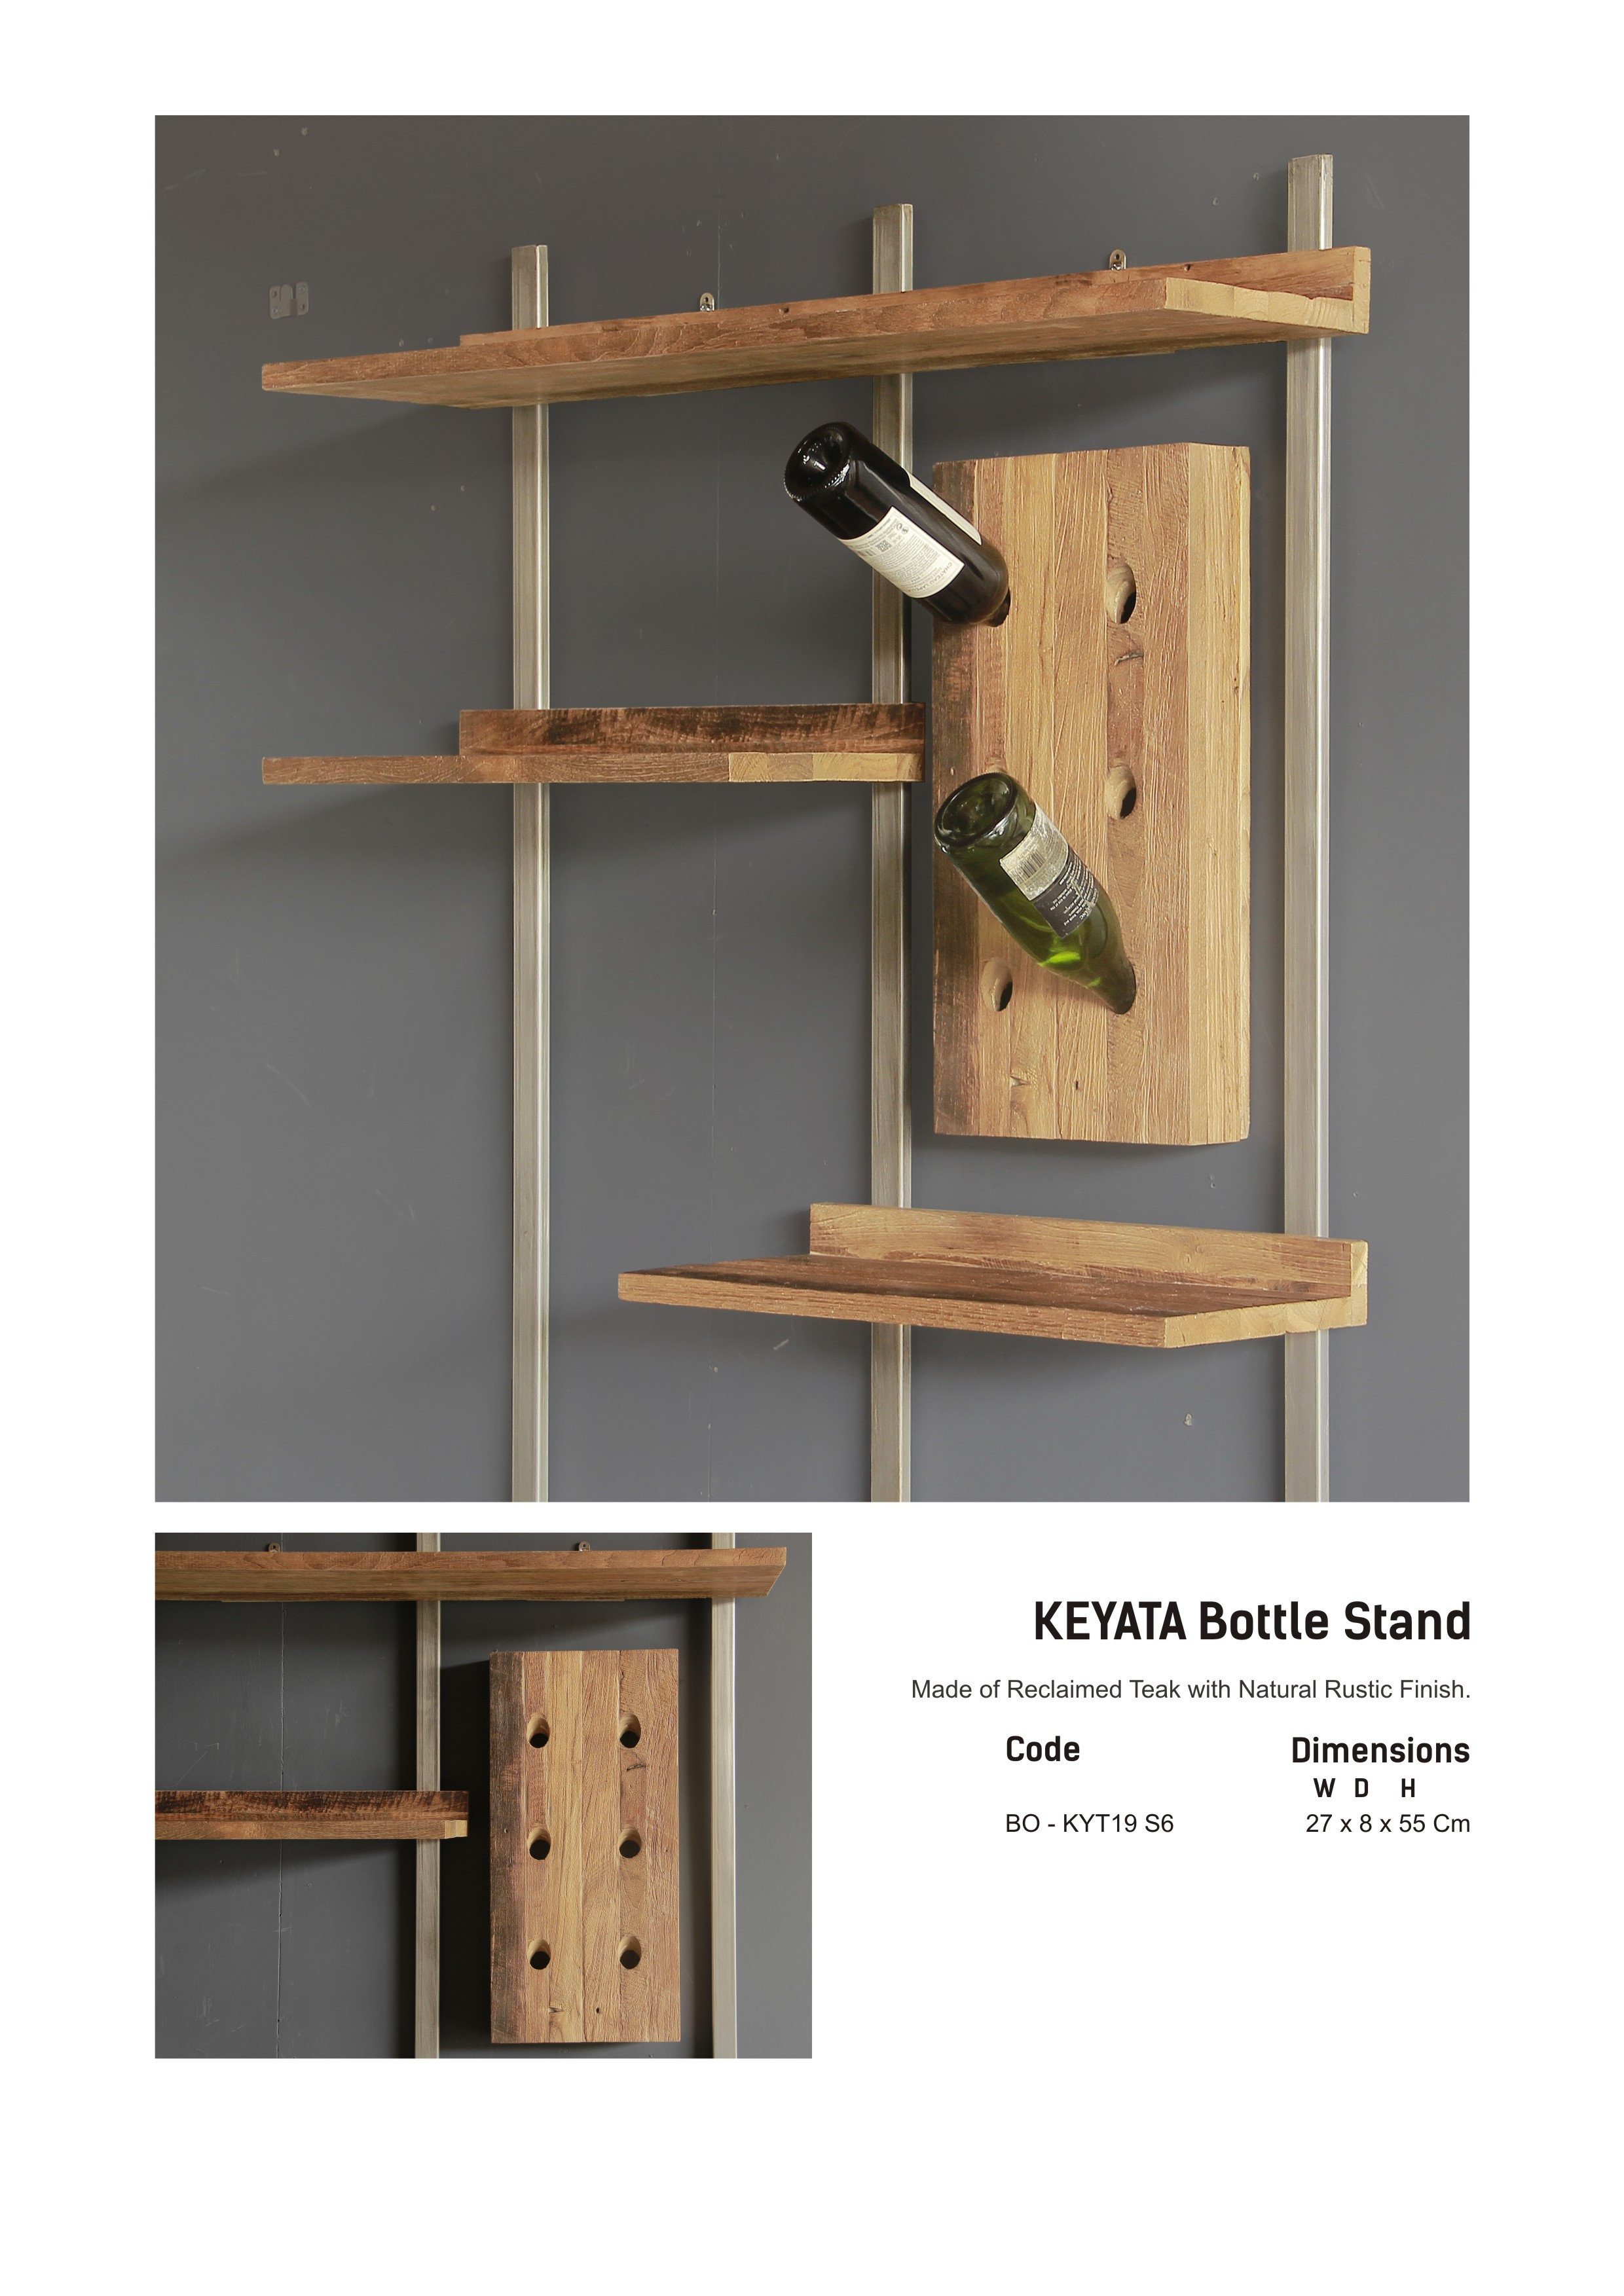 19. KEYATA Bottle Stand